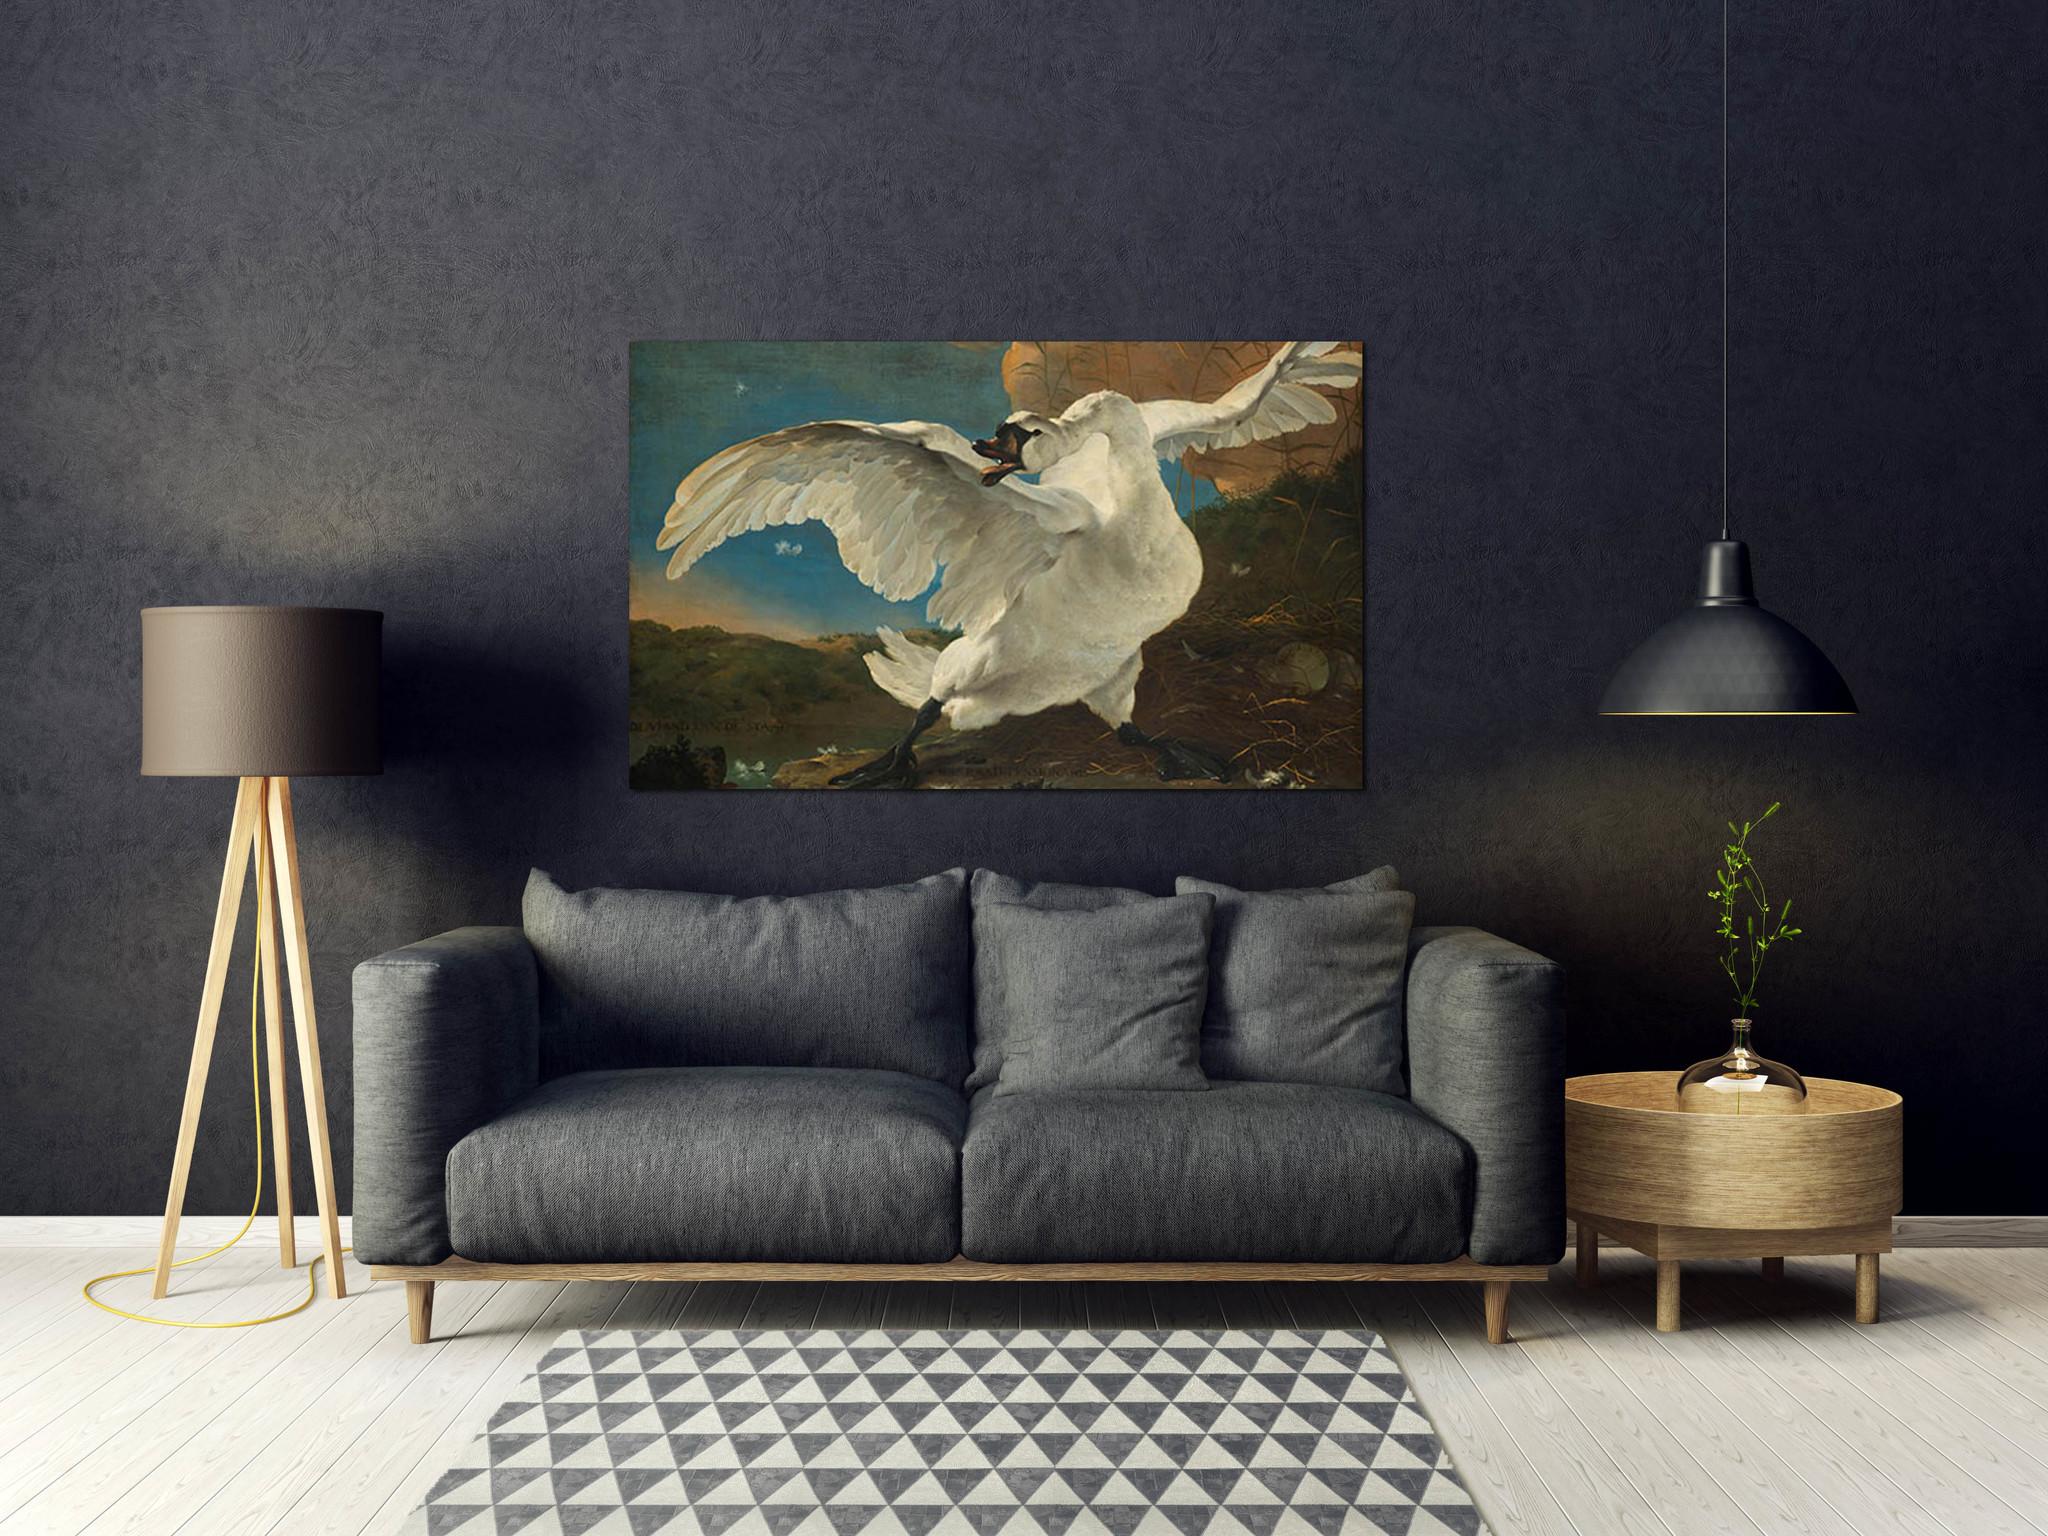 De bedreigde zwaan - Jan Asselijn